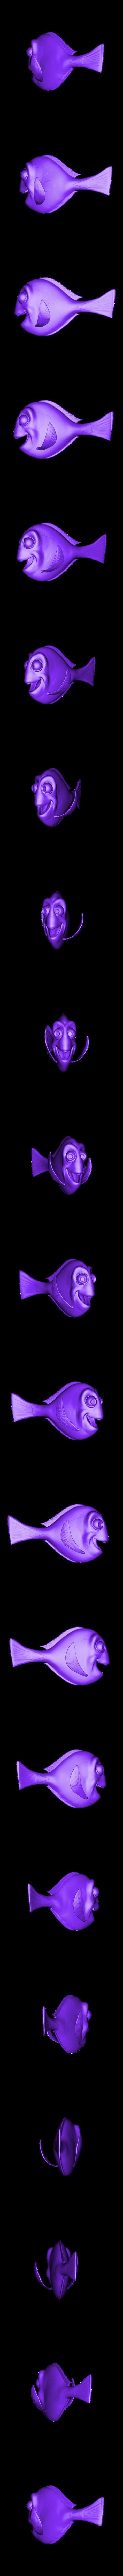 Dory-print_SubTool1.stl Download STL file Dory 3D Comic Fish • Template to 3D print, udograf